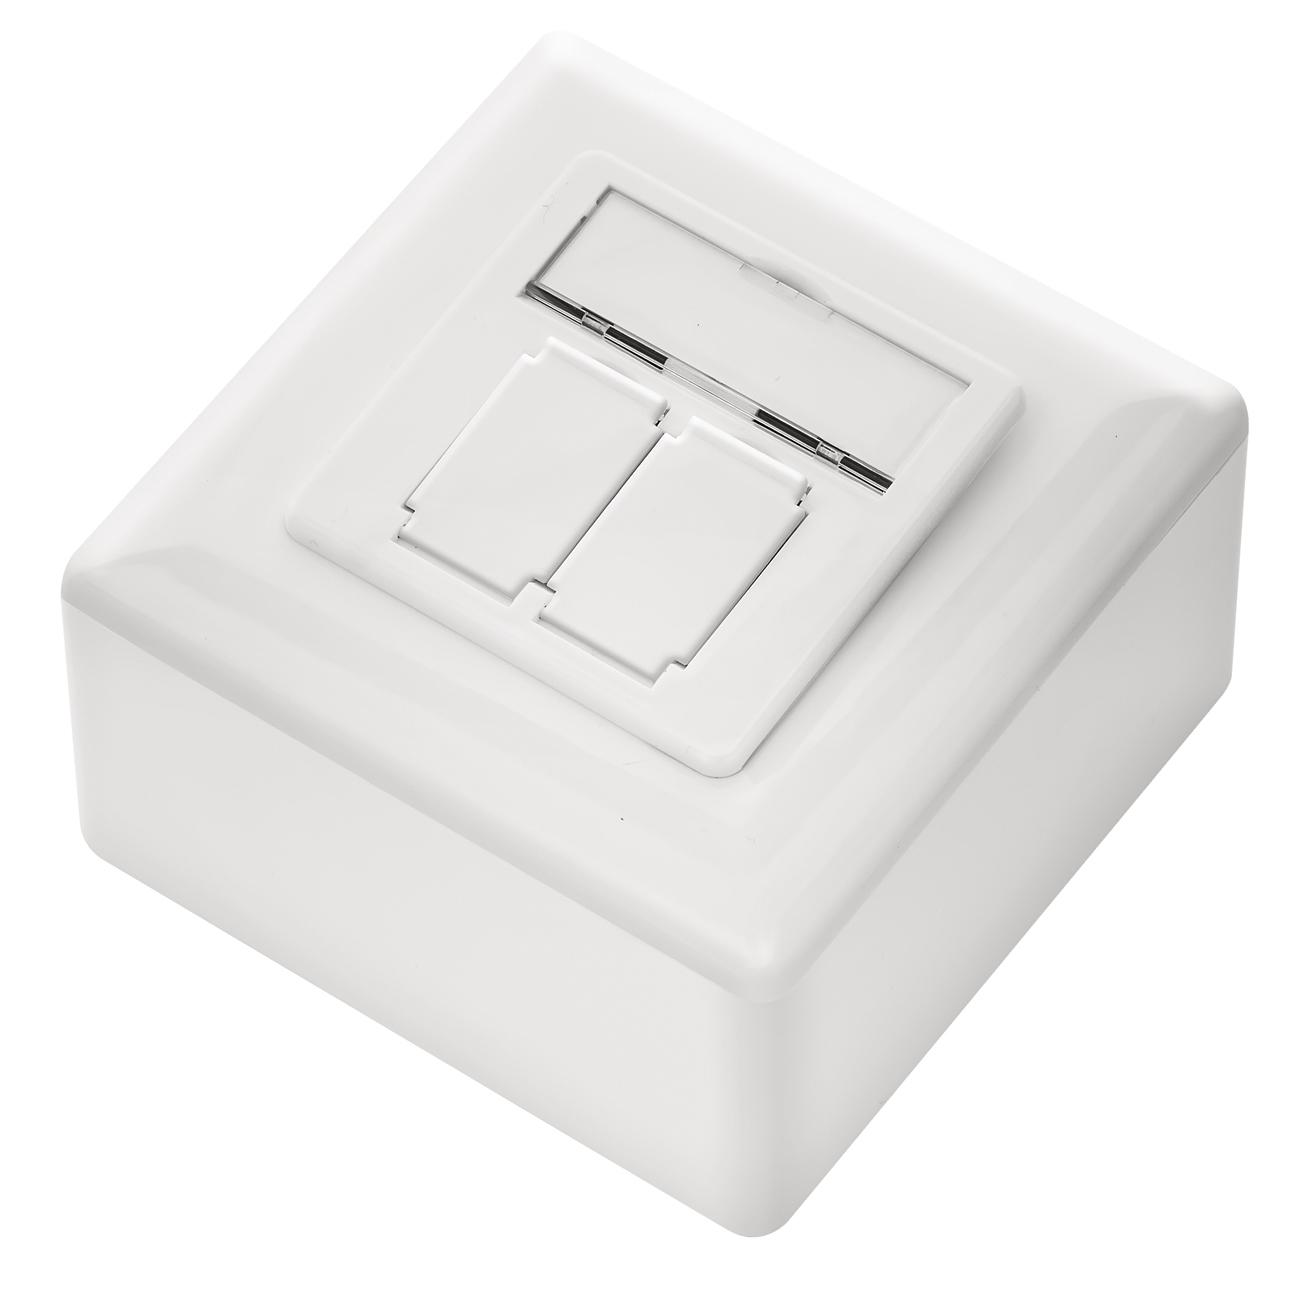 deleycon cat6a netzwerkdose wei deleycon. Black Bedroom Furniture Sets. Home Design Ideas